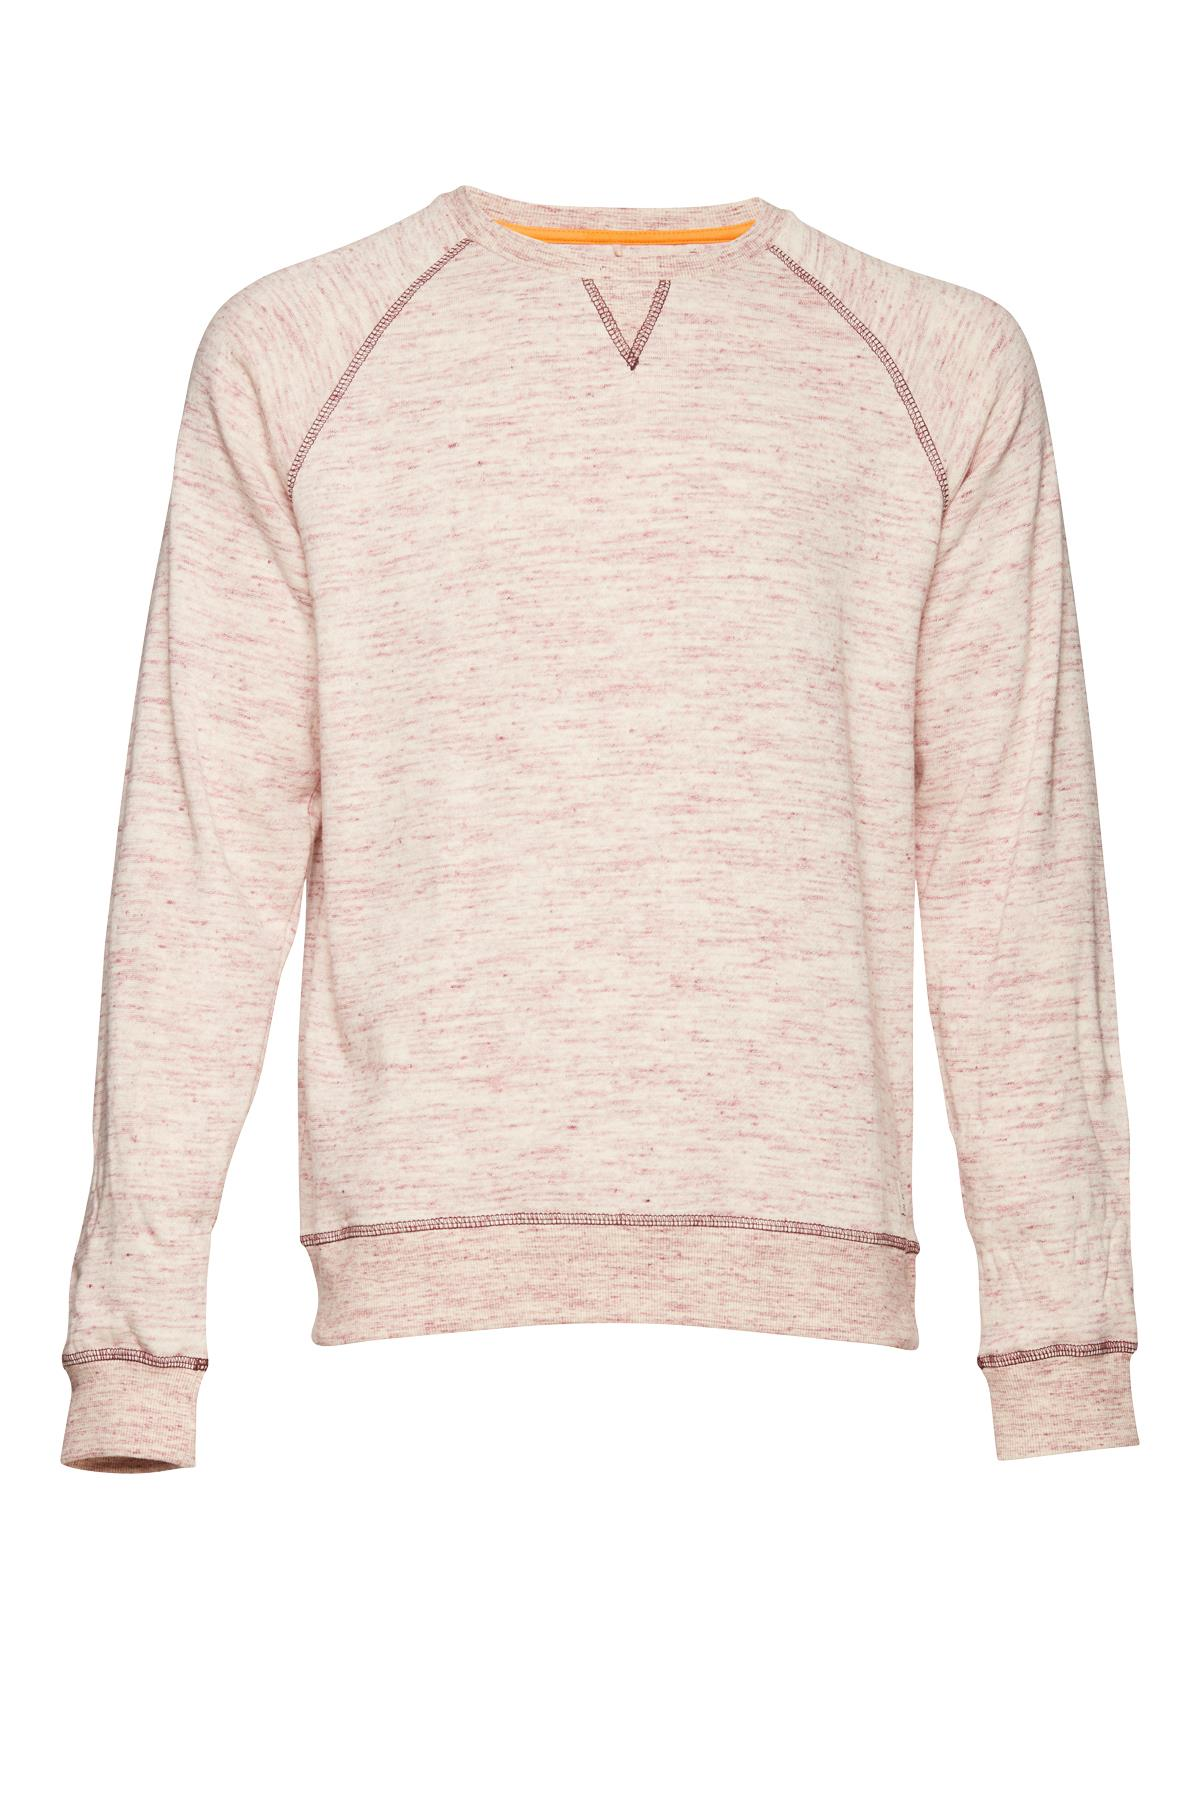 Wollweiss/pink